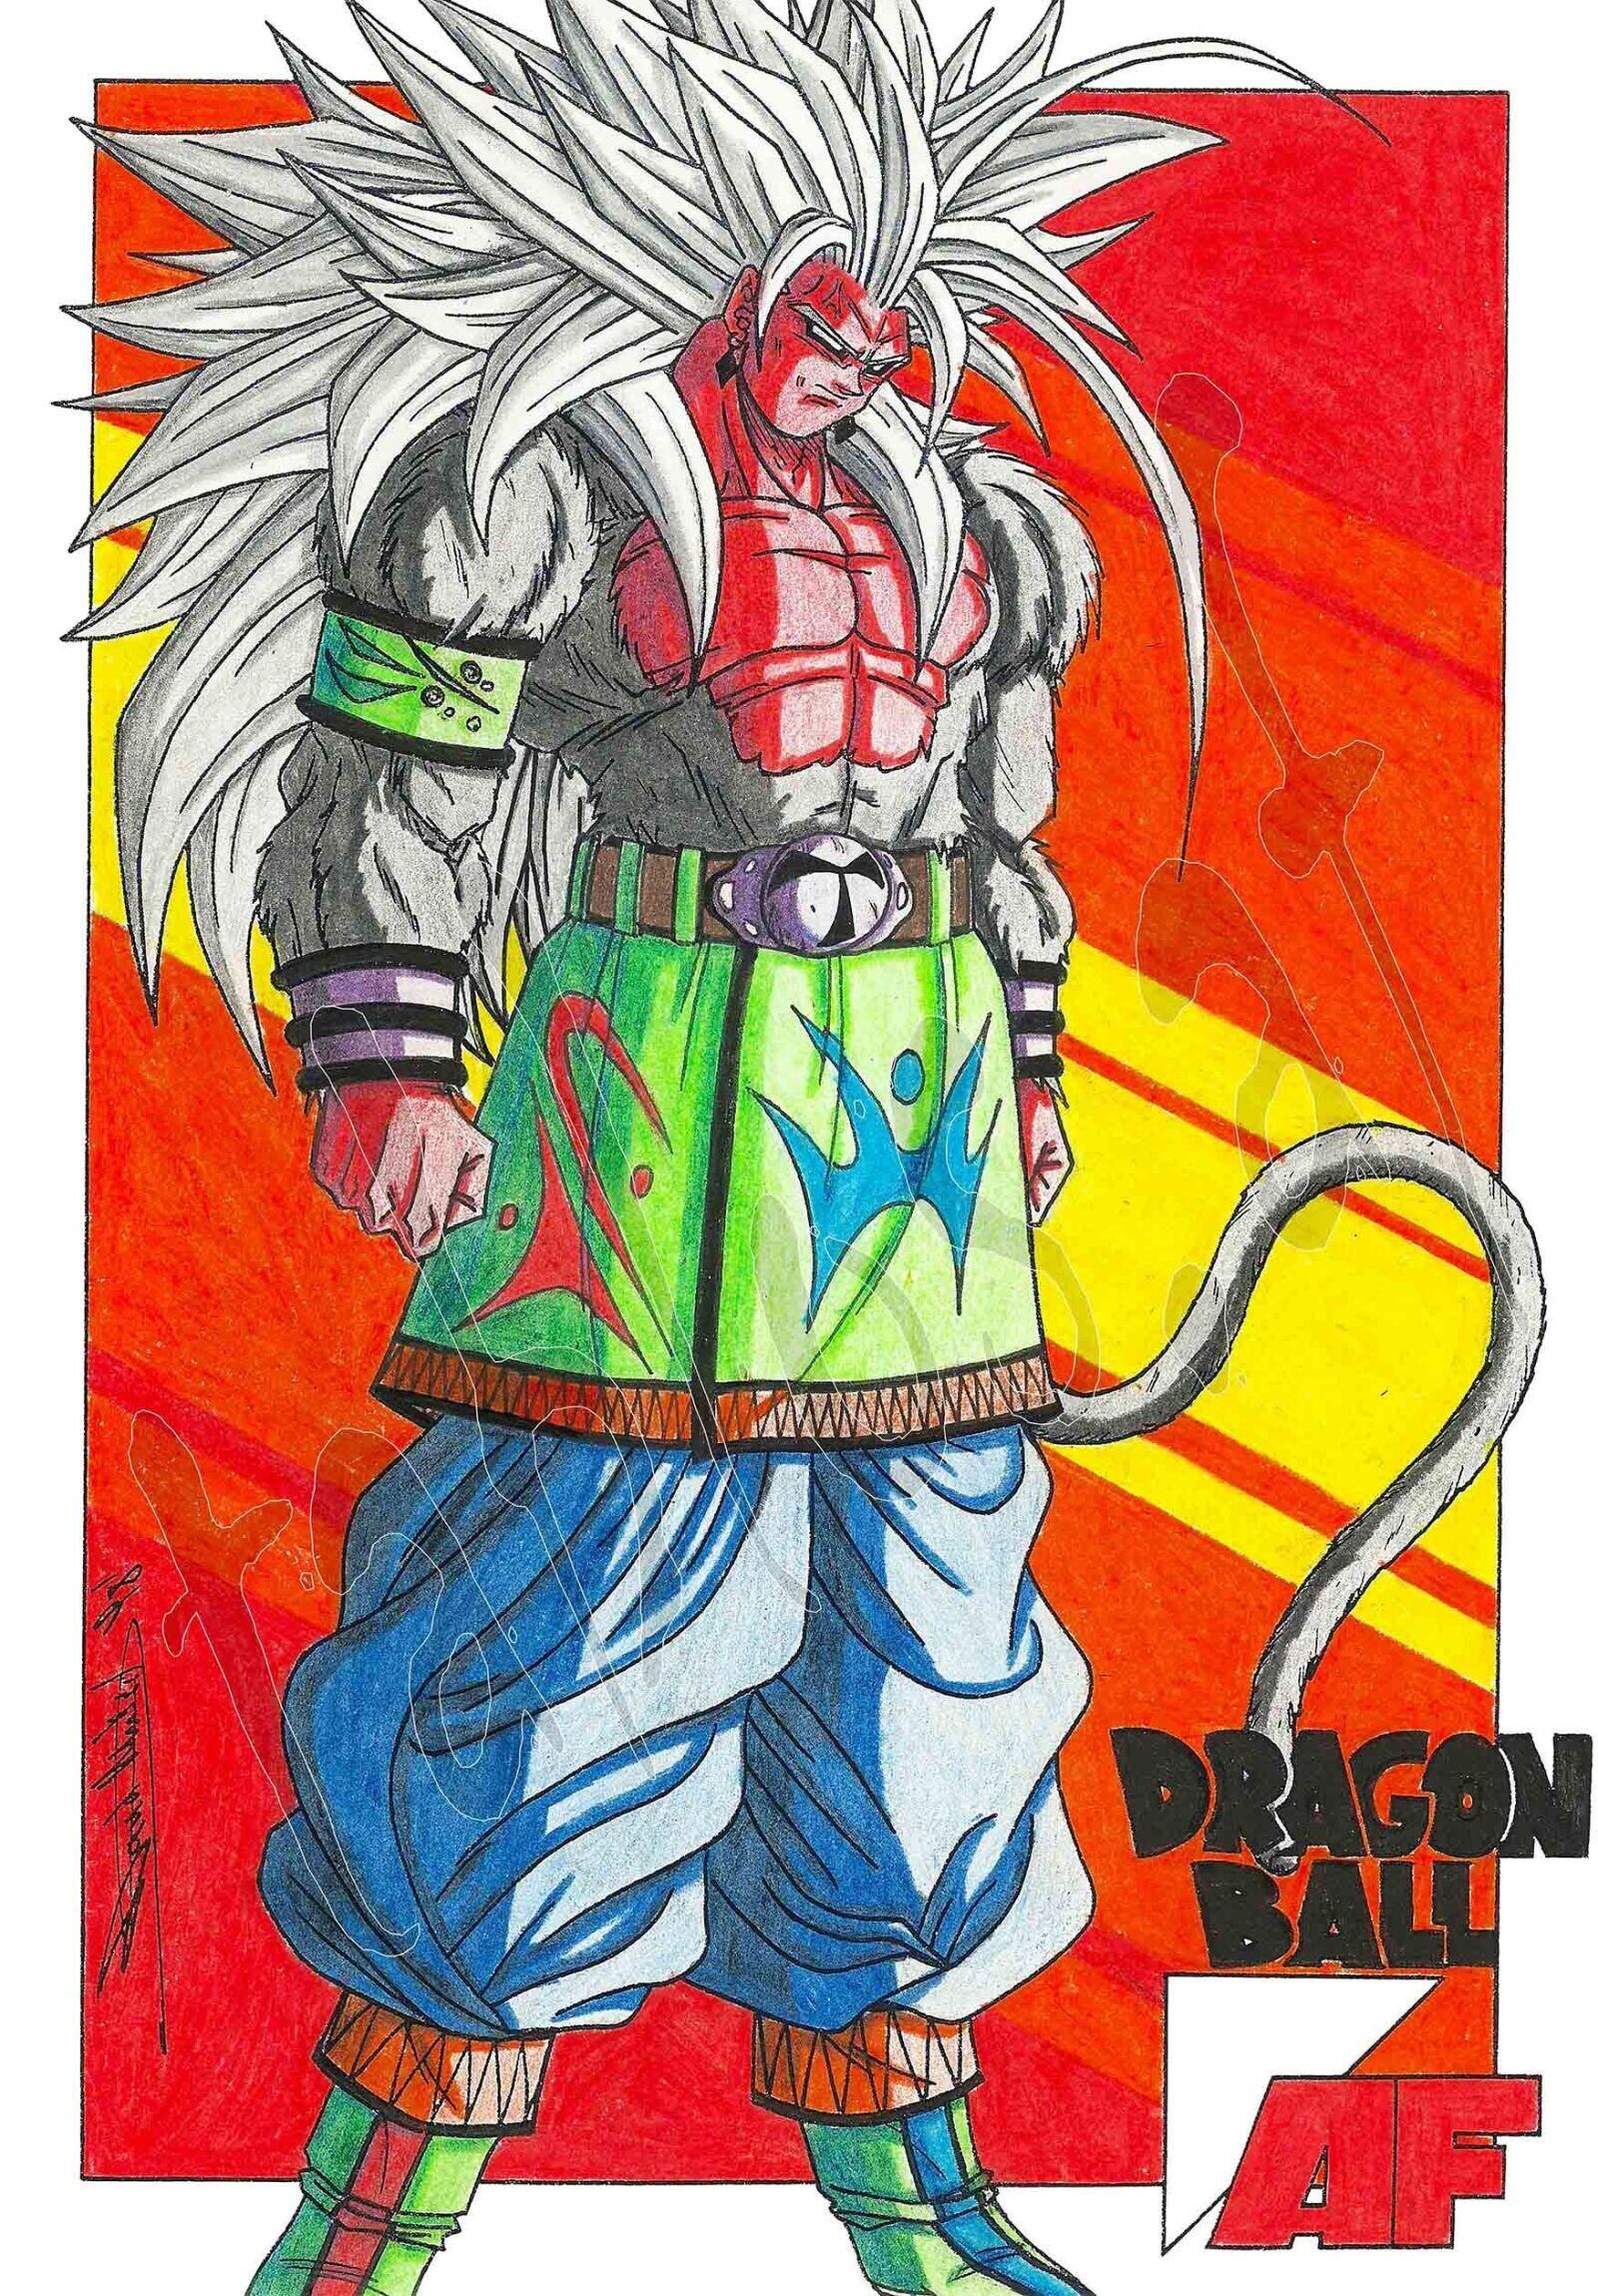 dragon ball budokai tenkaichi af download pc